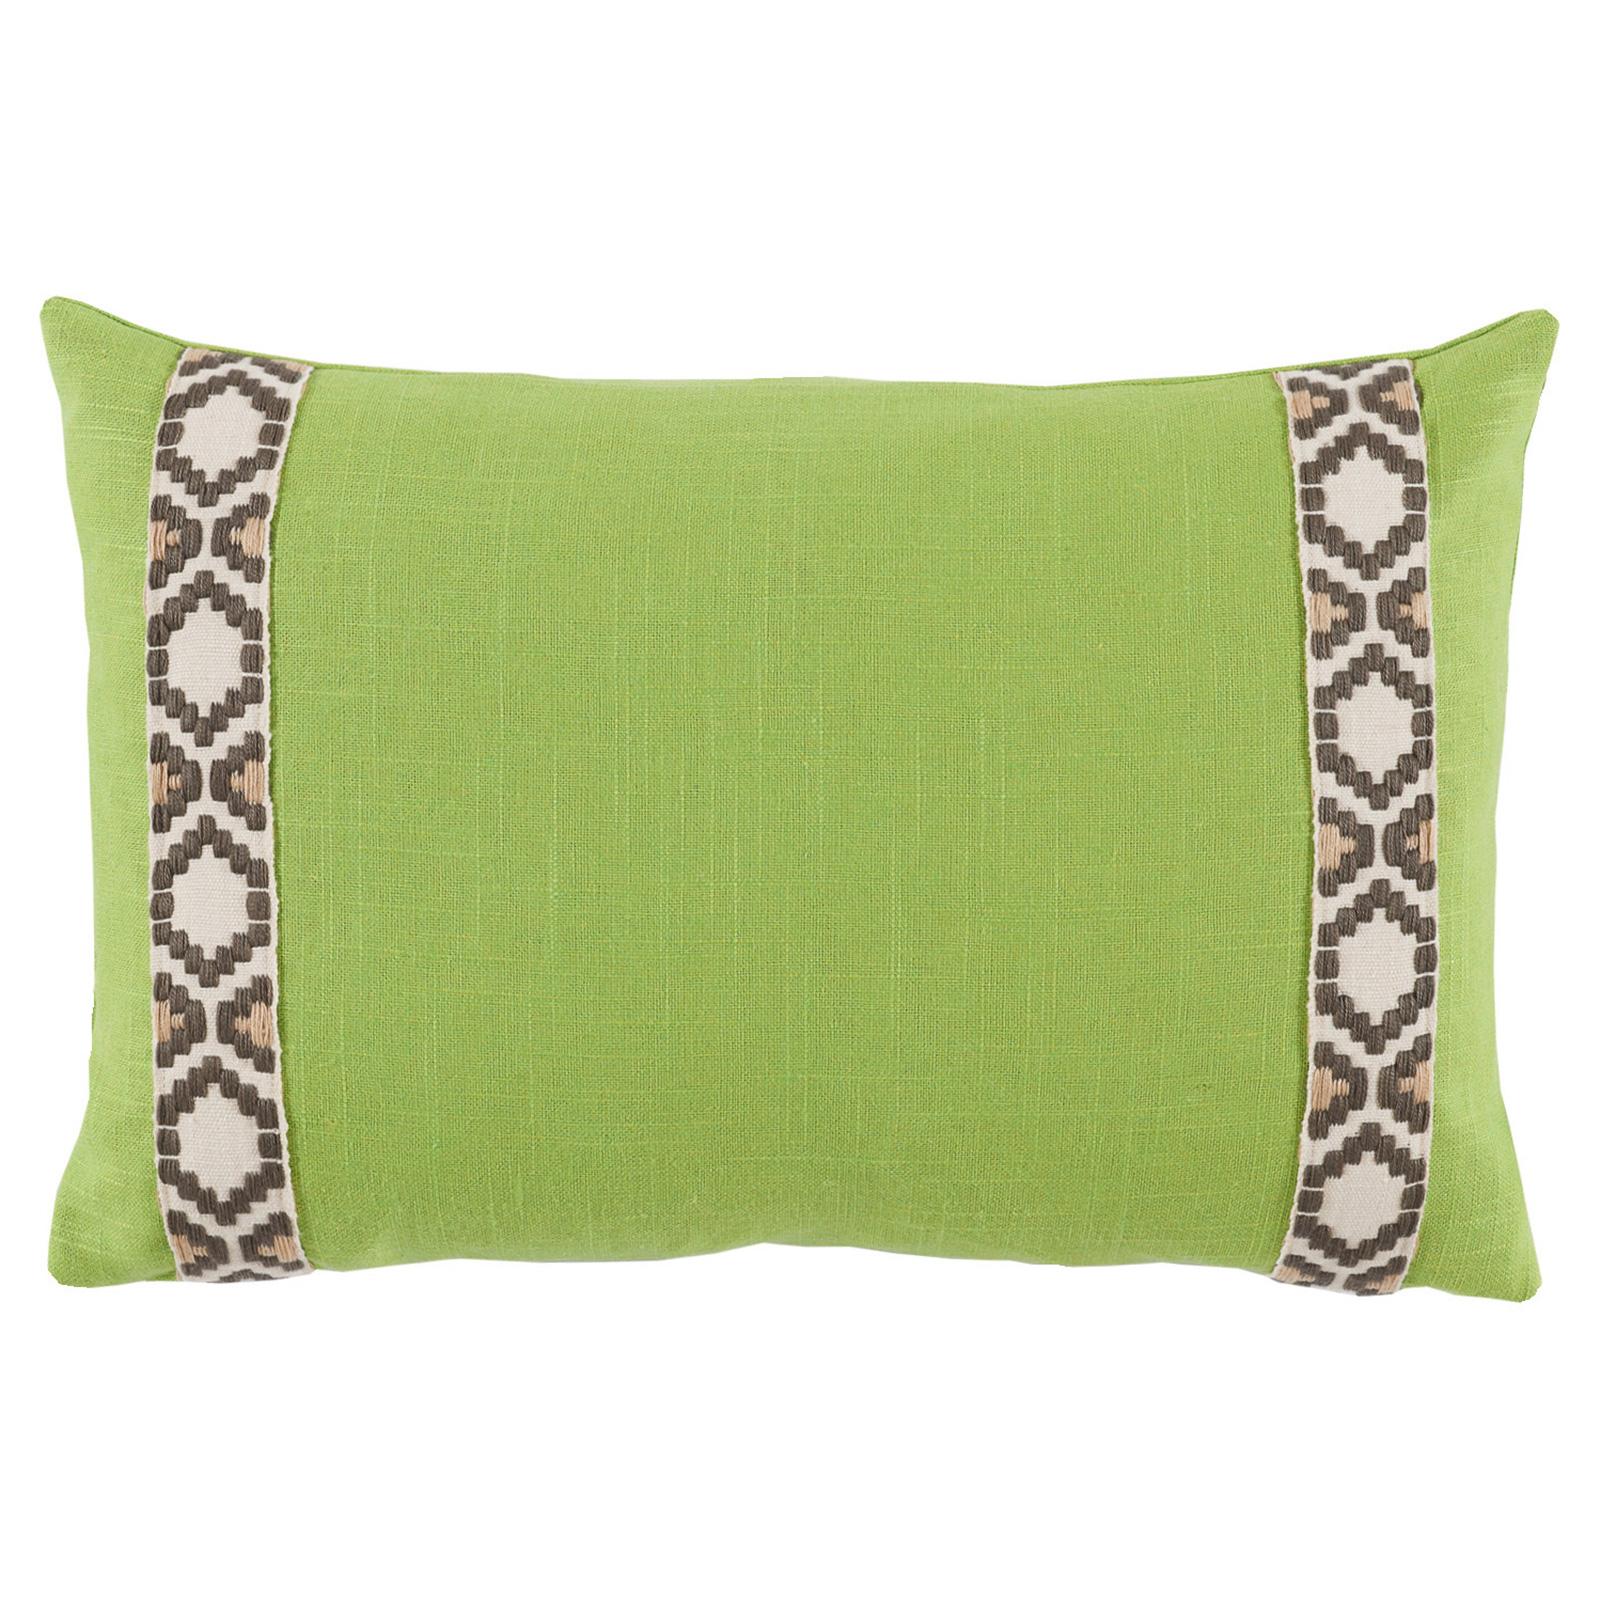 Kaia Global Lime Green Linen Trim Band Pillow - 13x19